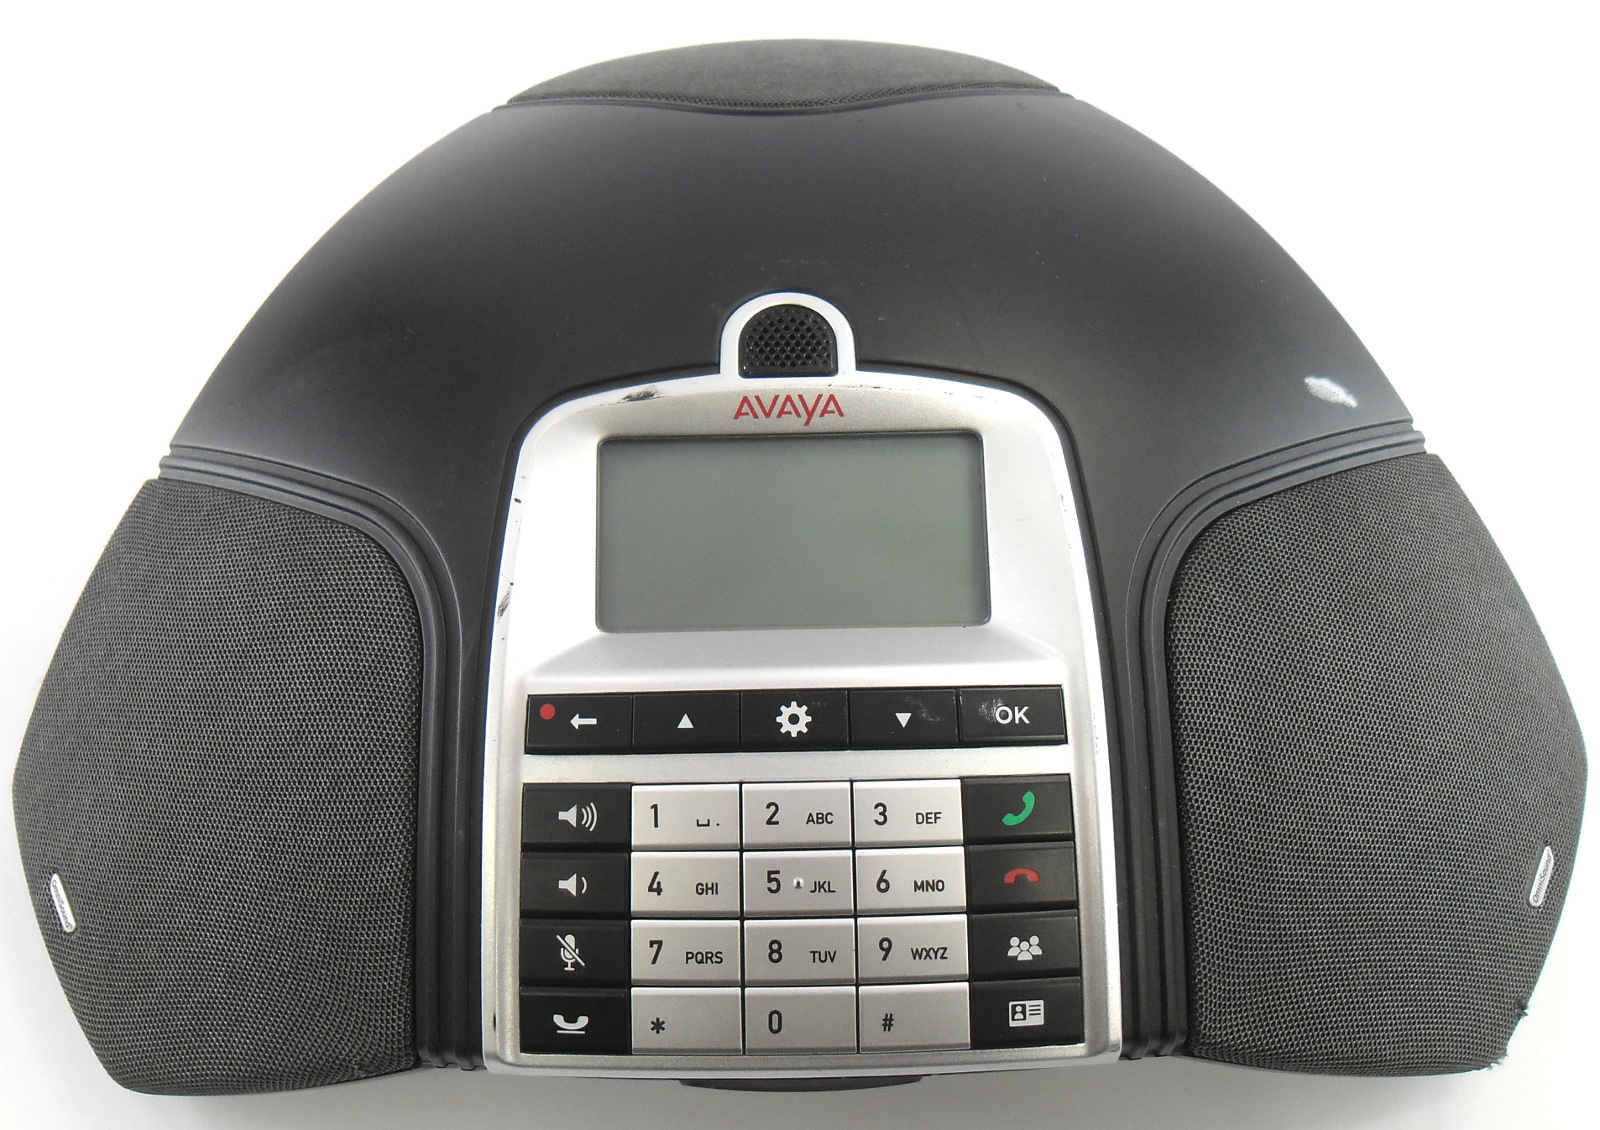 Avaya B149 Analog Conference phone 700501533